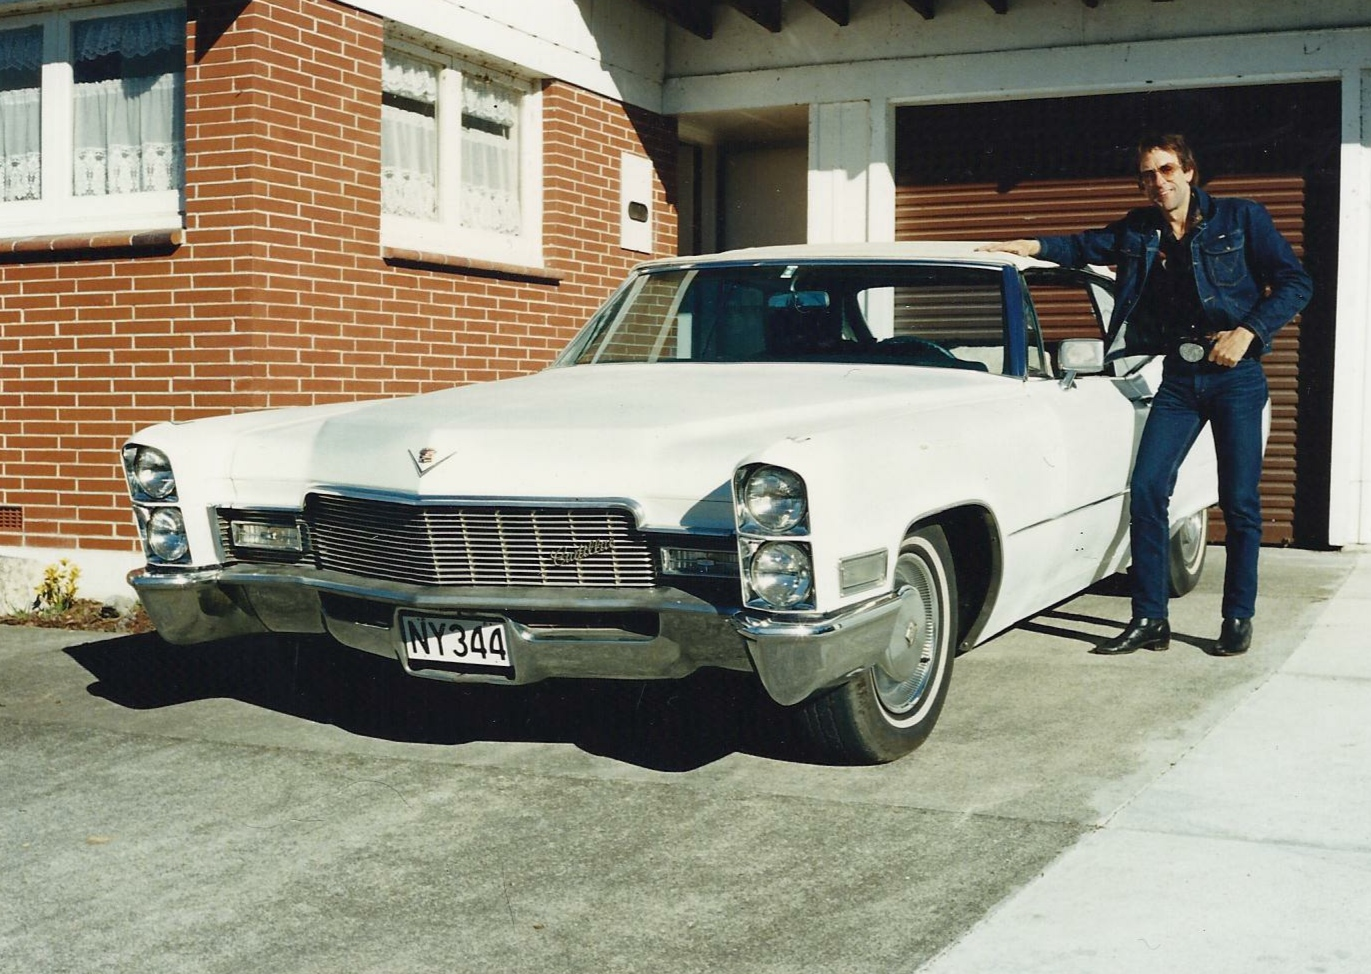 1968 cadillac coupe deville convertible 1968 cadillac coupe deville convertible publicscrutiny Image collections